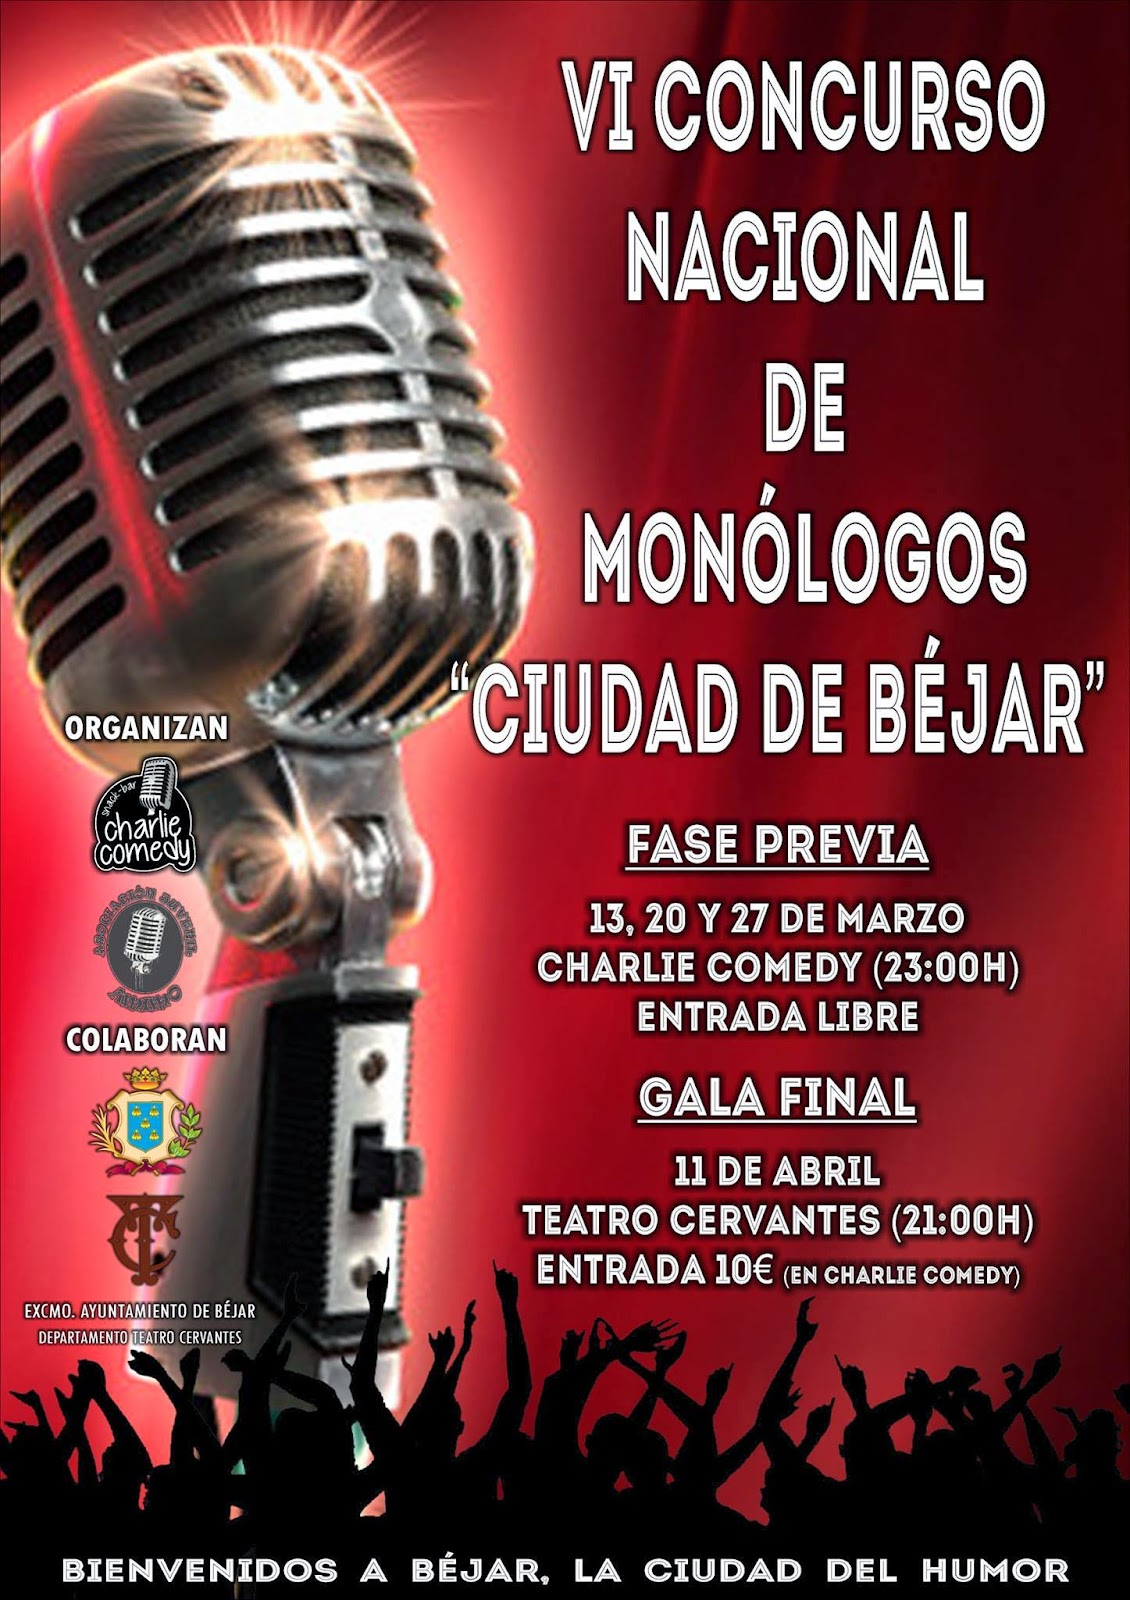 https://lh3.googleusercontent.com/-M13WvOUPBv8/VPtHYcCK5zI/AAAAAAAALCQ/7qcs7tLRxiw/w611-h865-no/Cartel_Concurso_Nacional_Monilogos.jpg